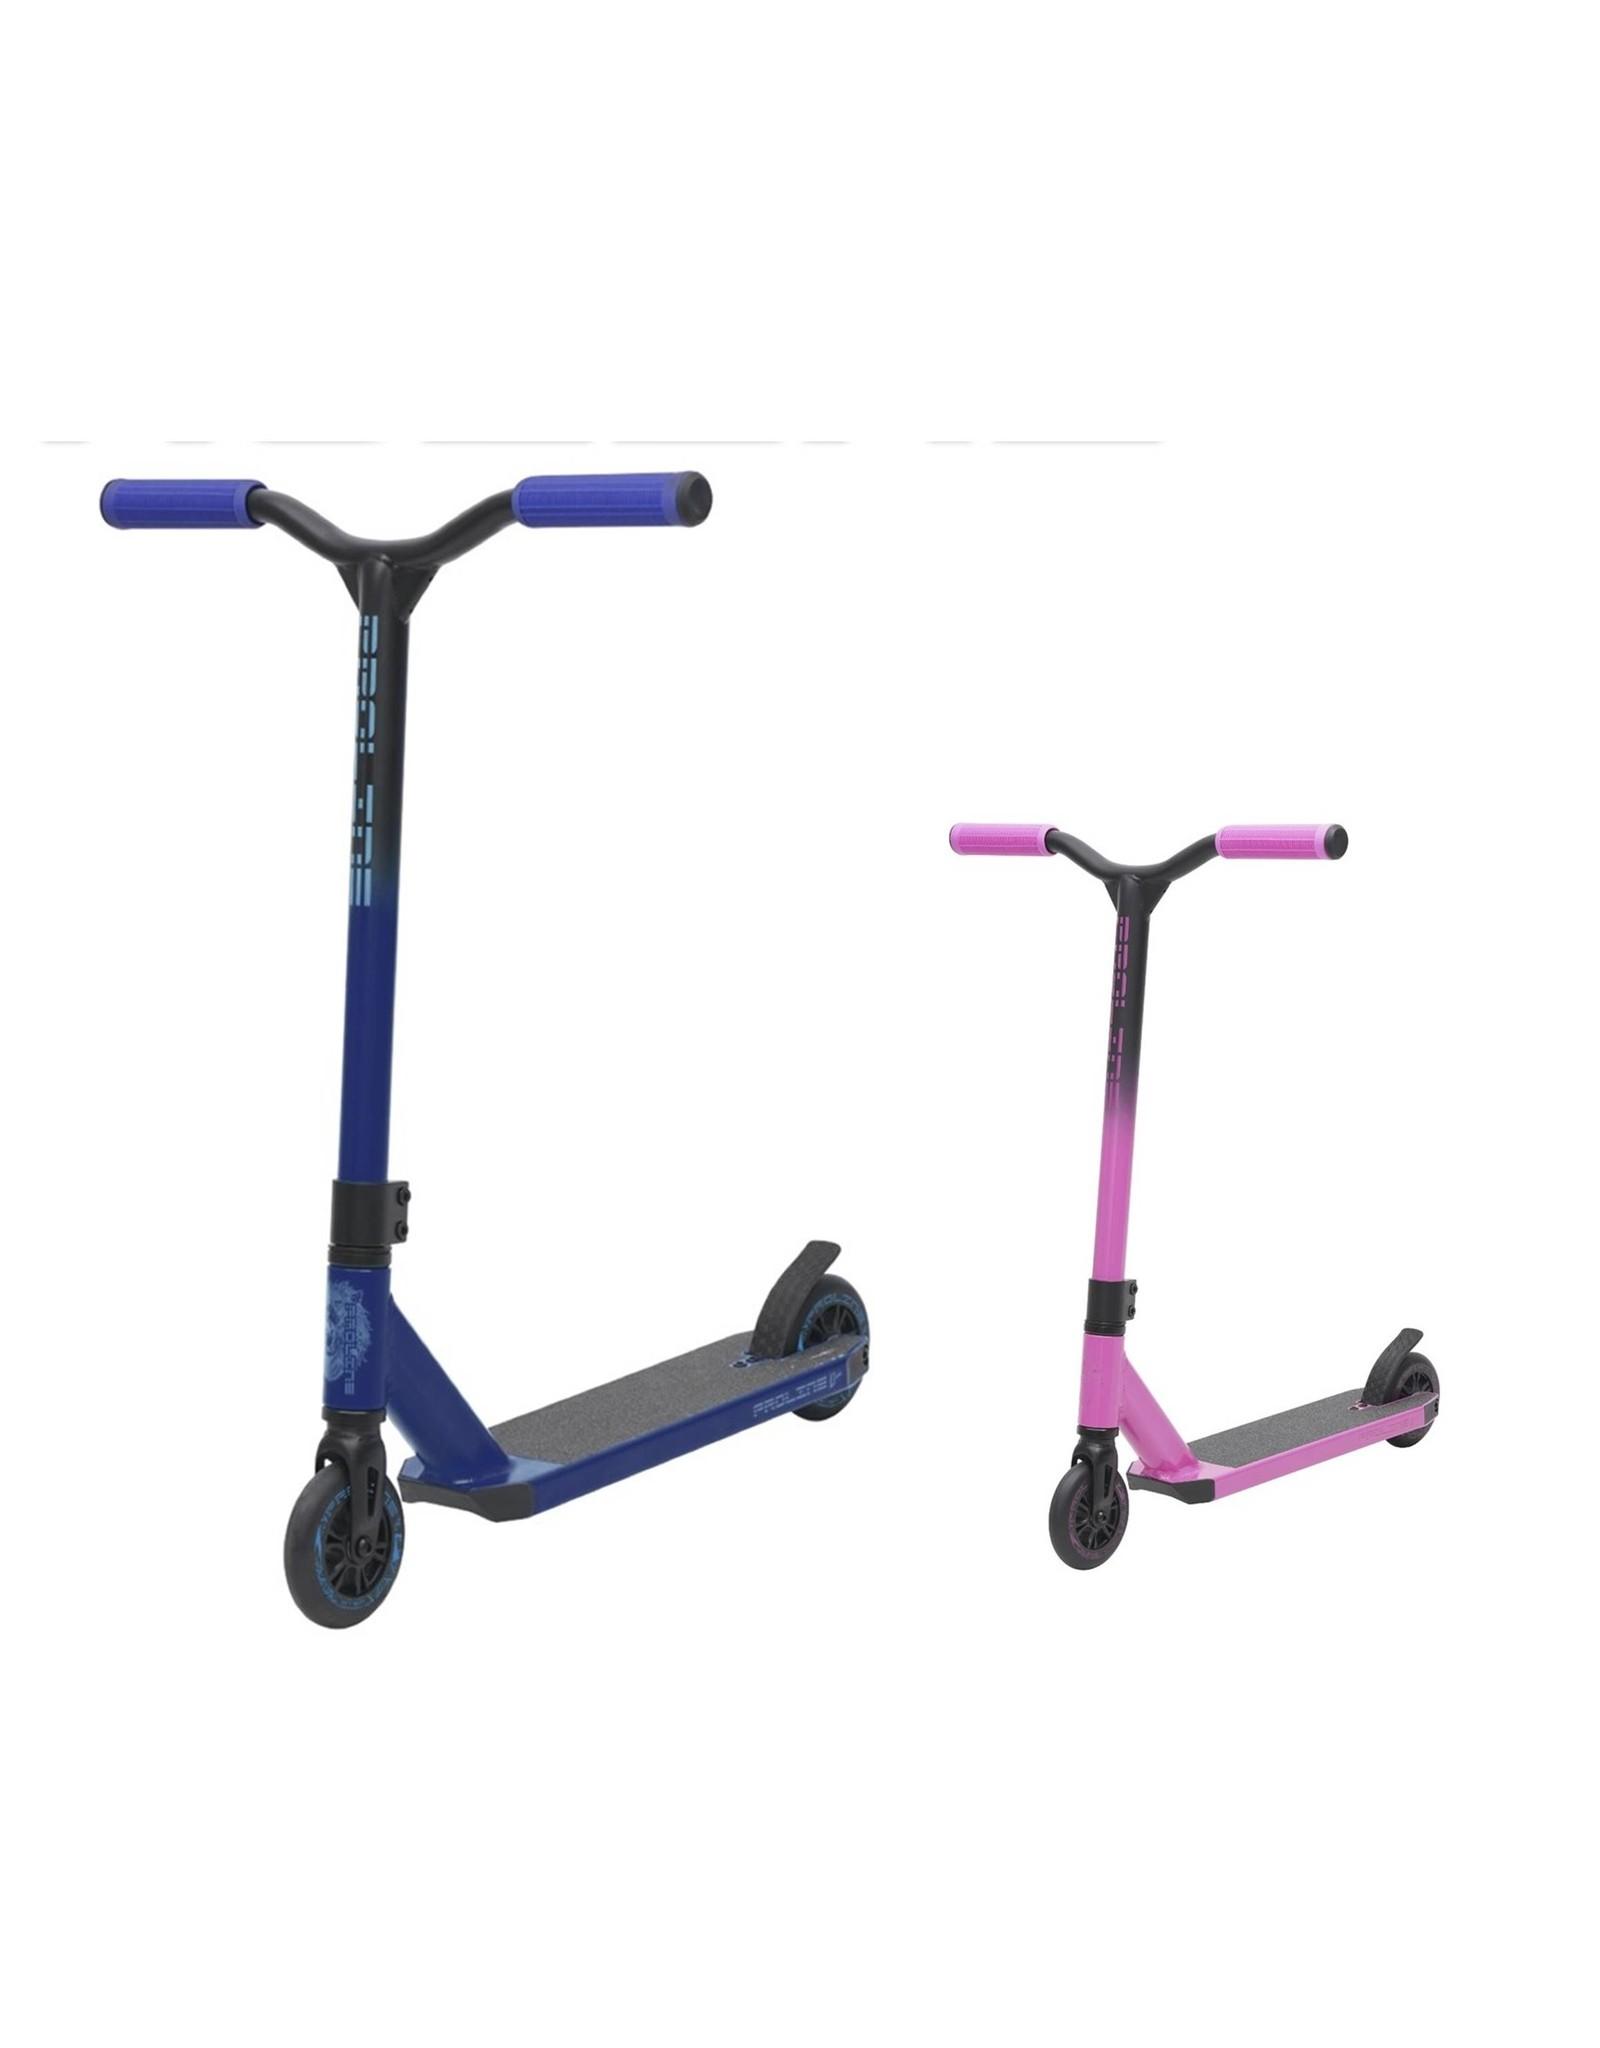 PROLINE Proline L1 Mini Scooter